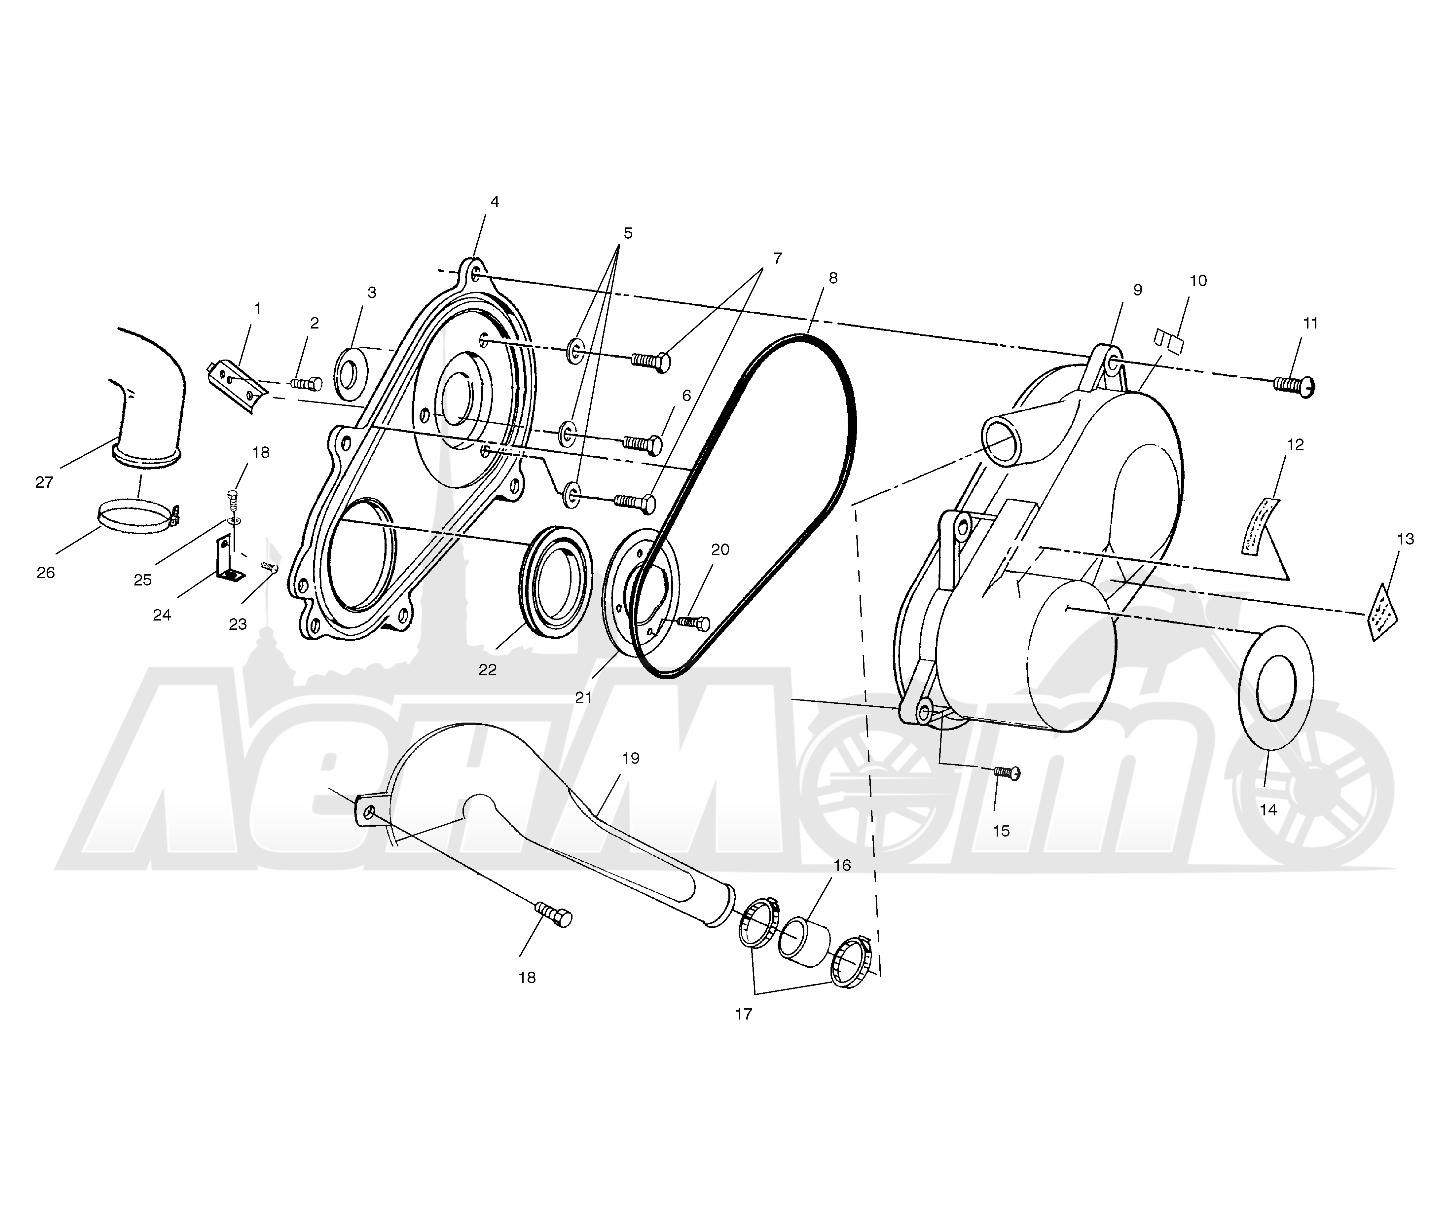 Запчасти для Квадроцикла Polaris 1997 SPORTSMAN 500 - W97CH50A Раздел: CLUTCH COVER - W97CH50A | сцепление крышка W97CH50A